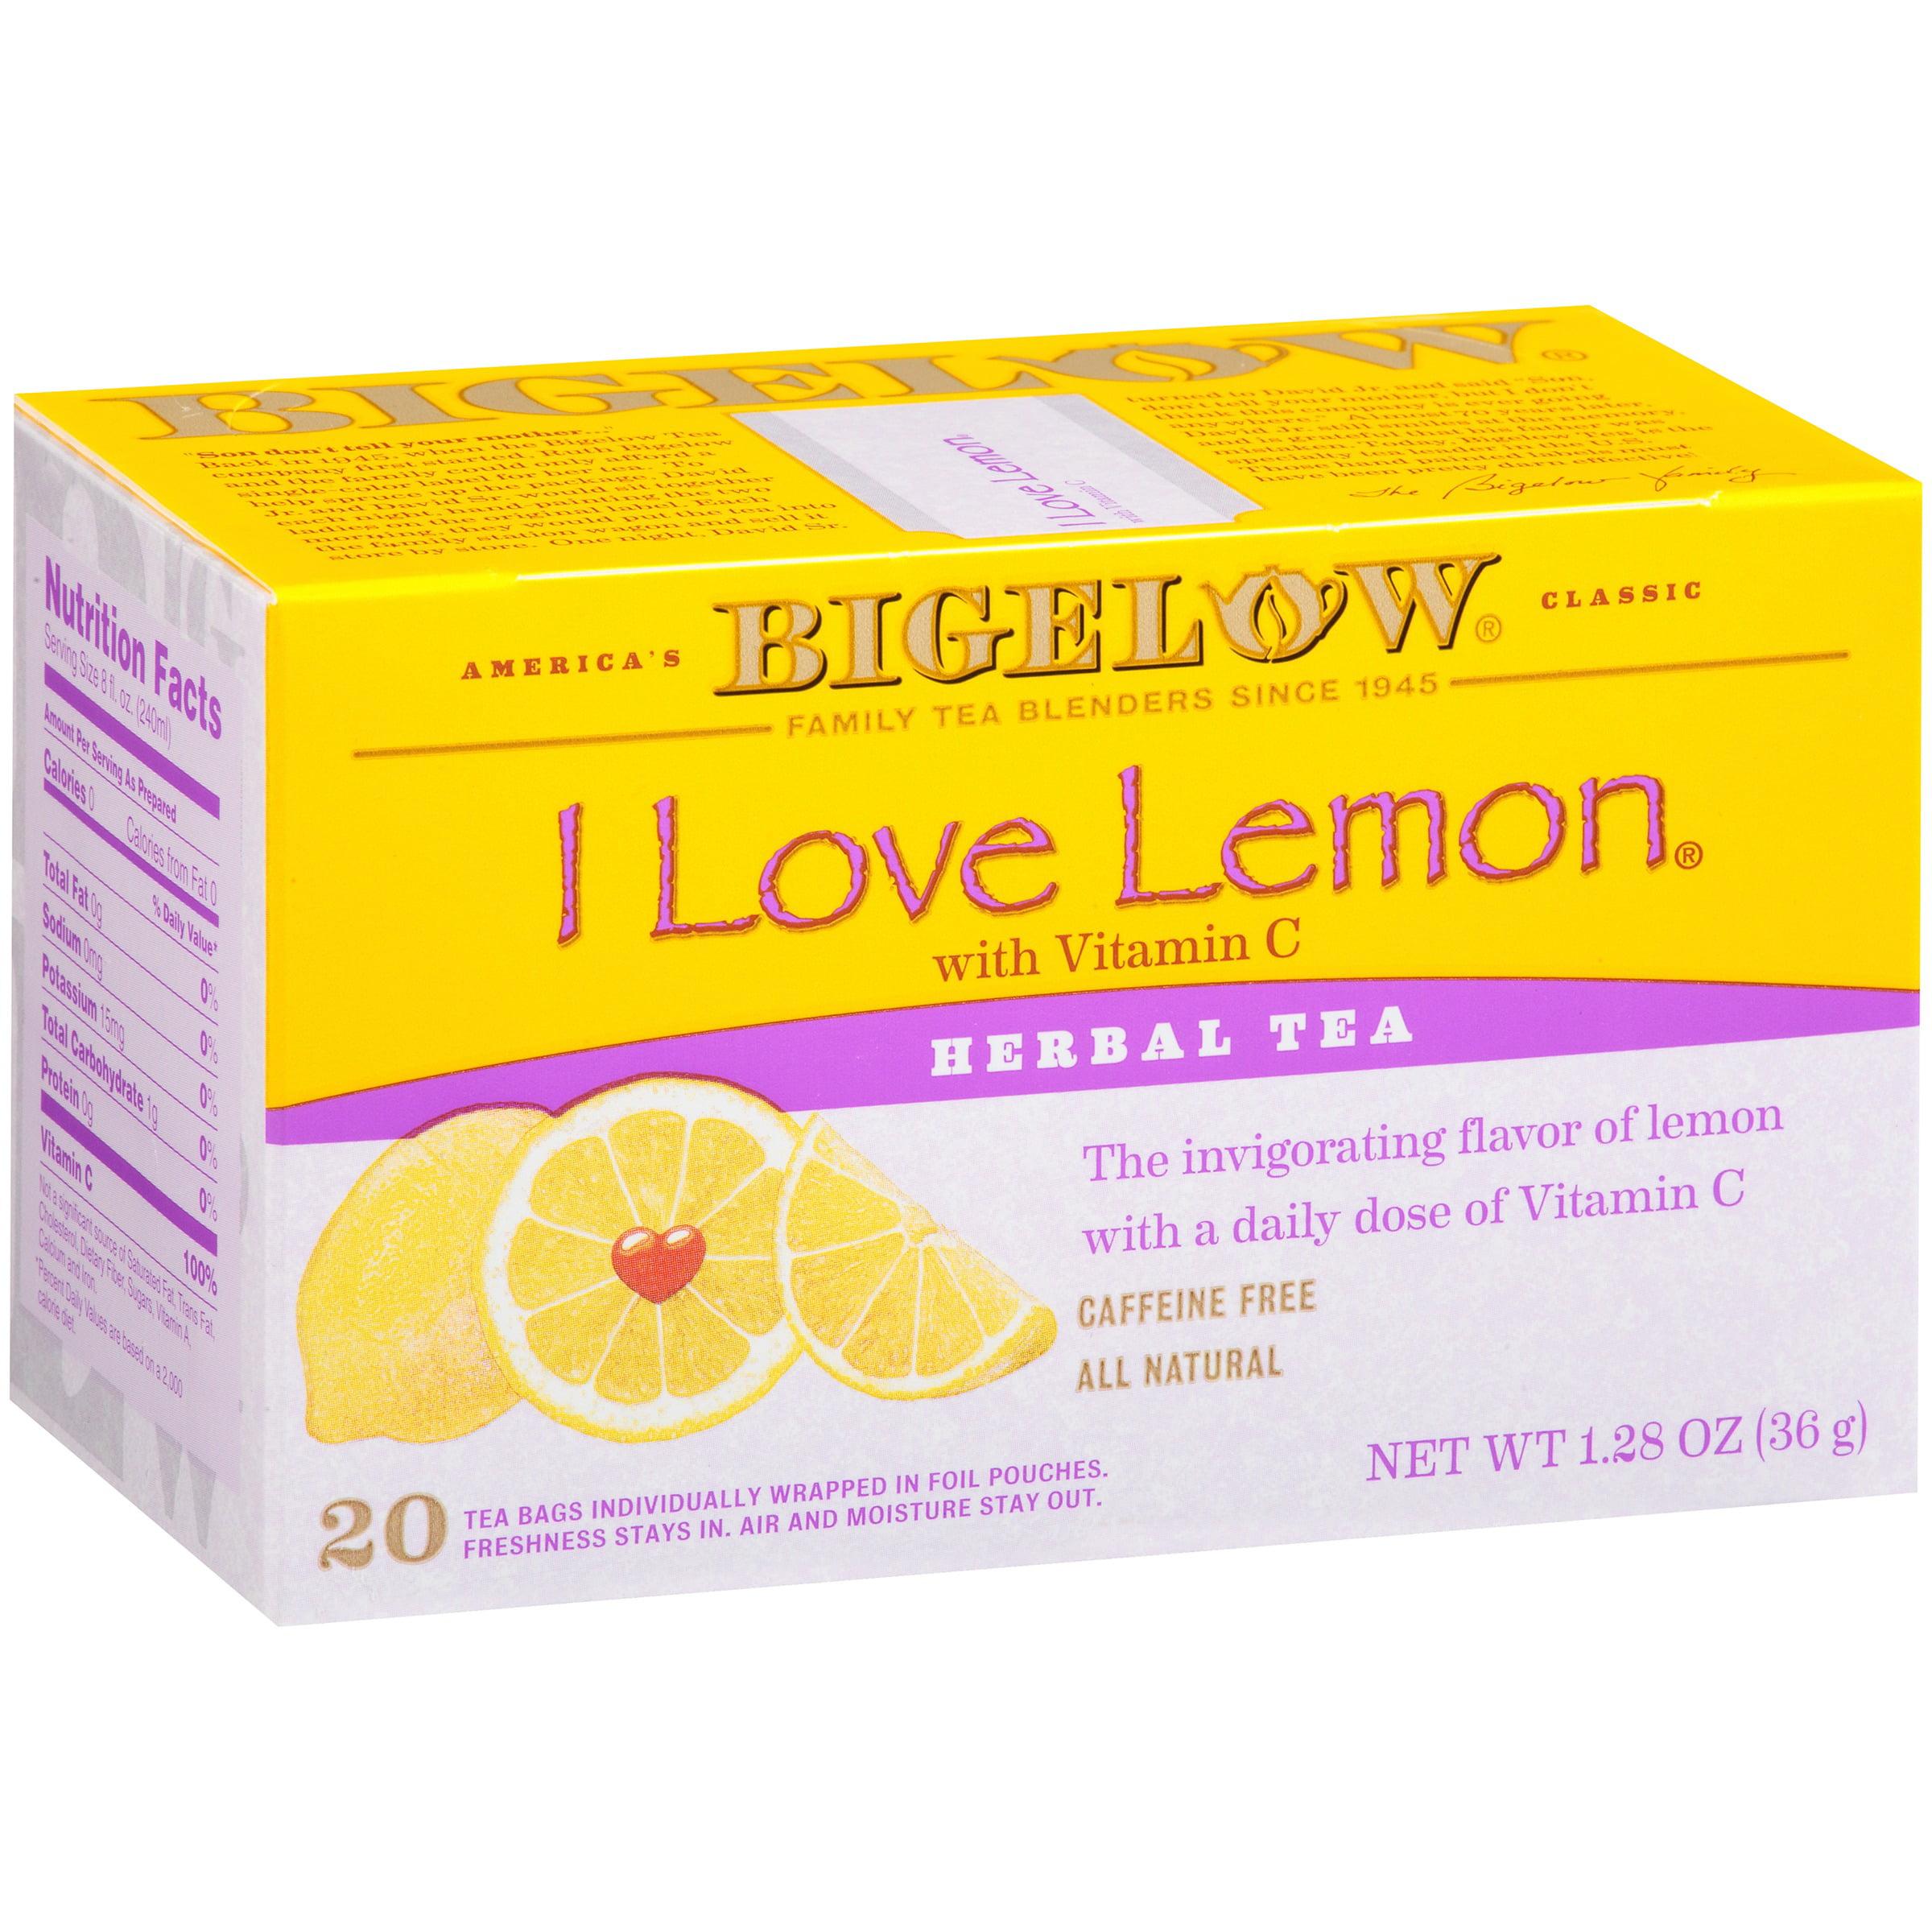 (3 Boxes) Bigelow® I Love Lemon® with Vitamin C Herbal Tea 1.28 oz. Box